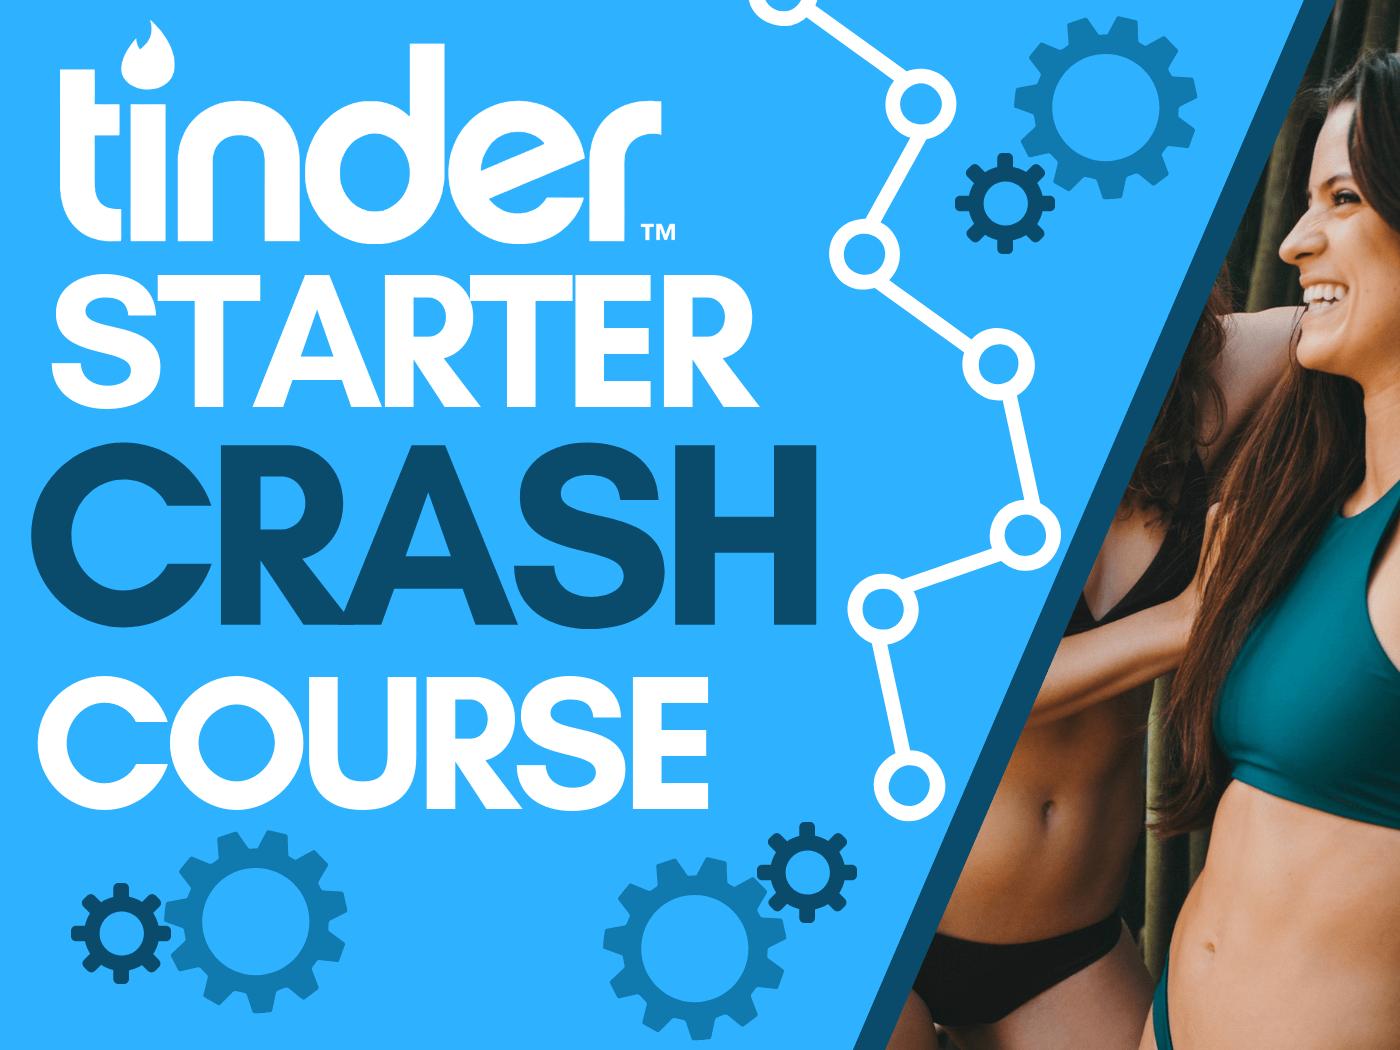 The Tinder Starter Crash Course